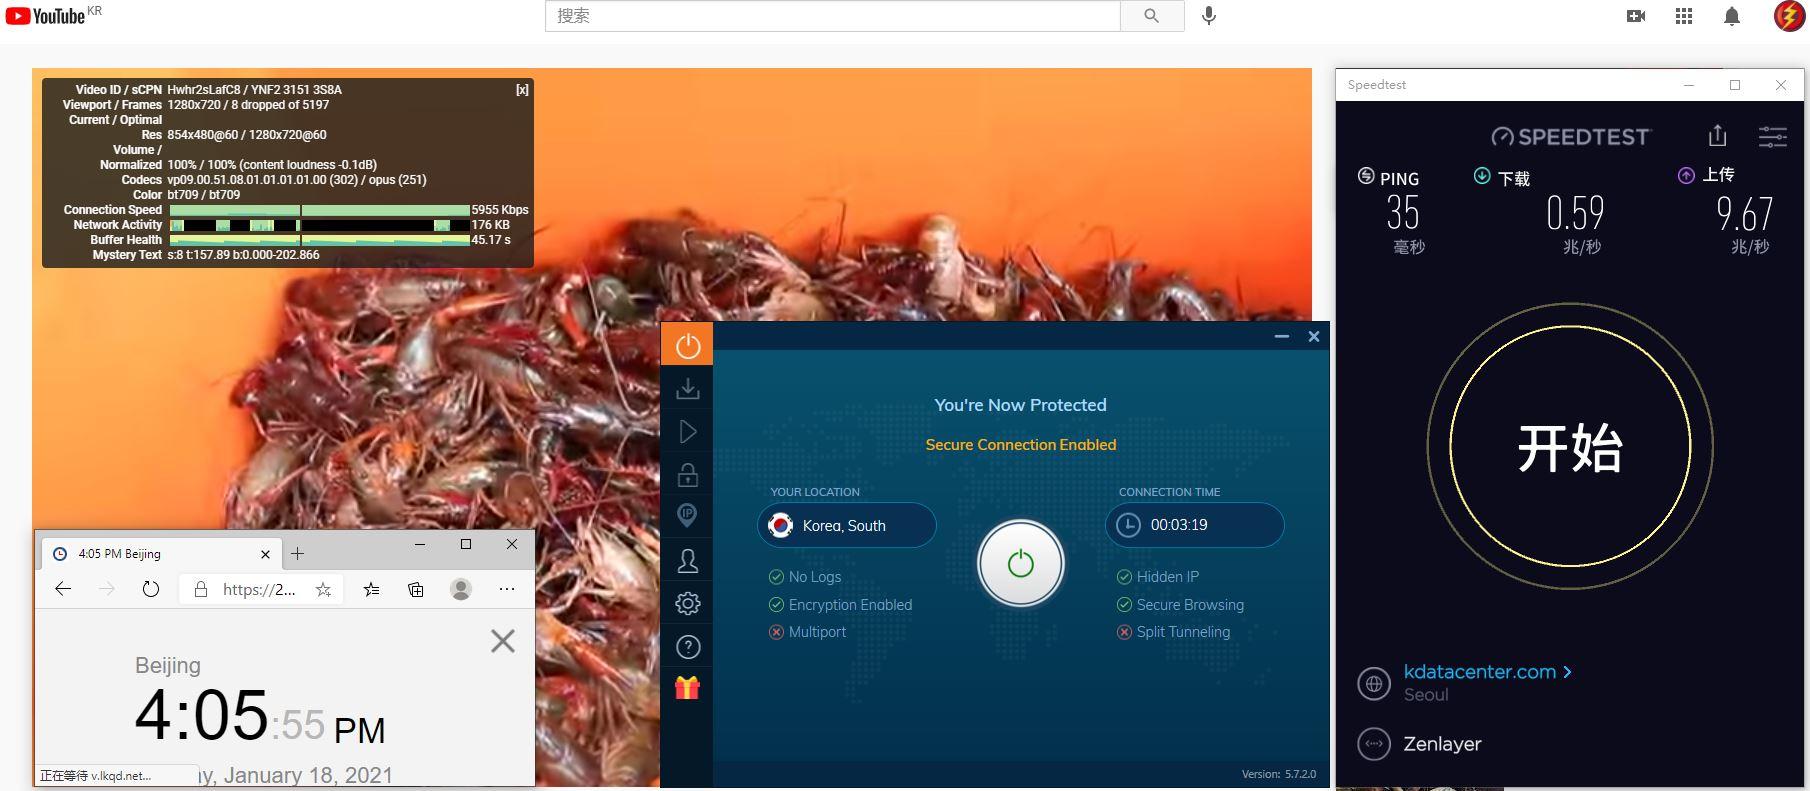 Windows10 IvacyVPN IKEv2 South Korea 服务器 中国VPN 翻墙 科学上网 10BEASTS Barry测试 - 20210118